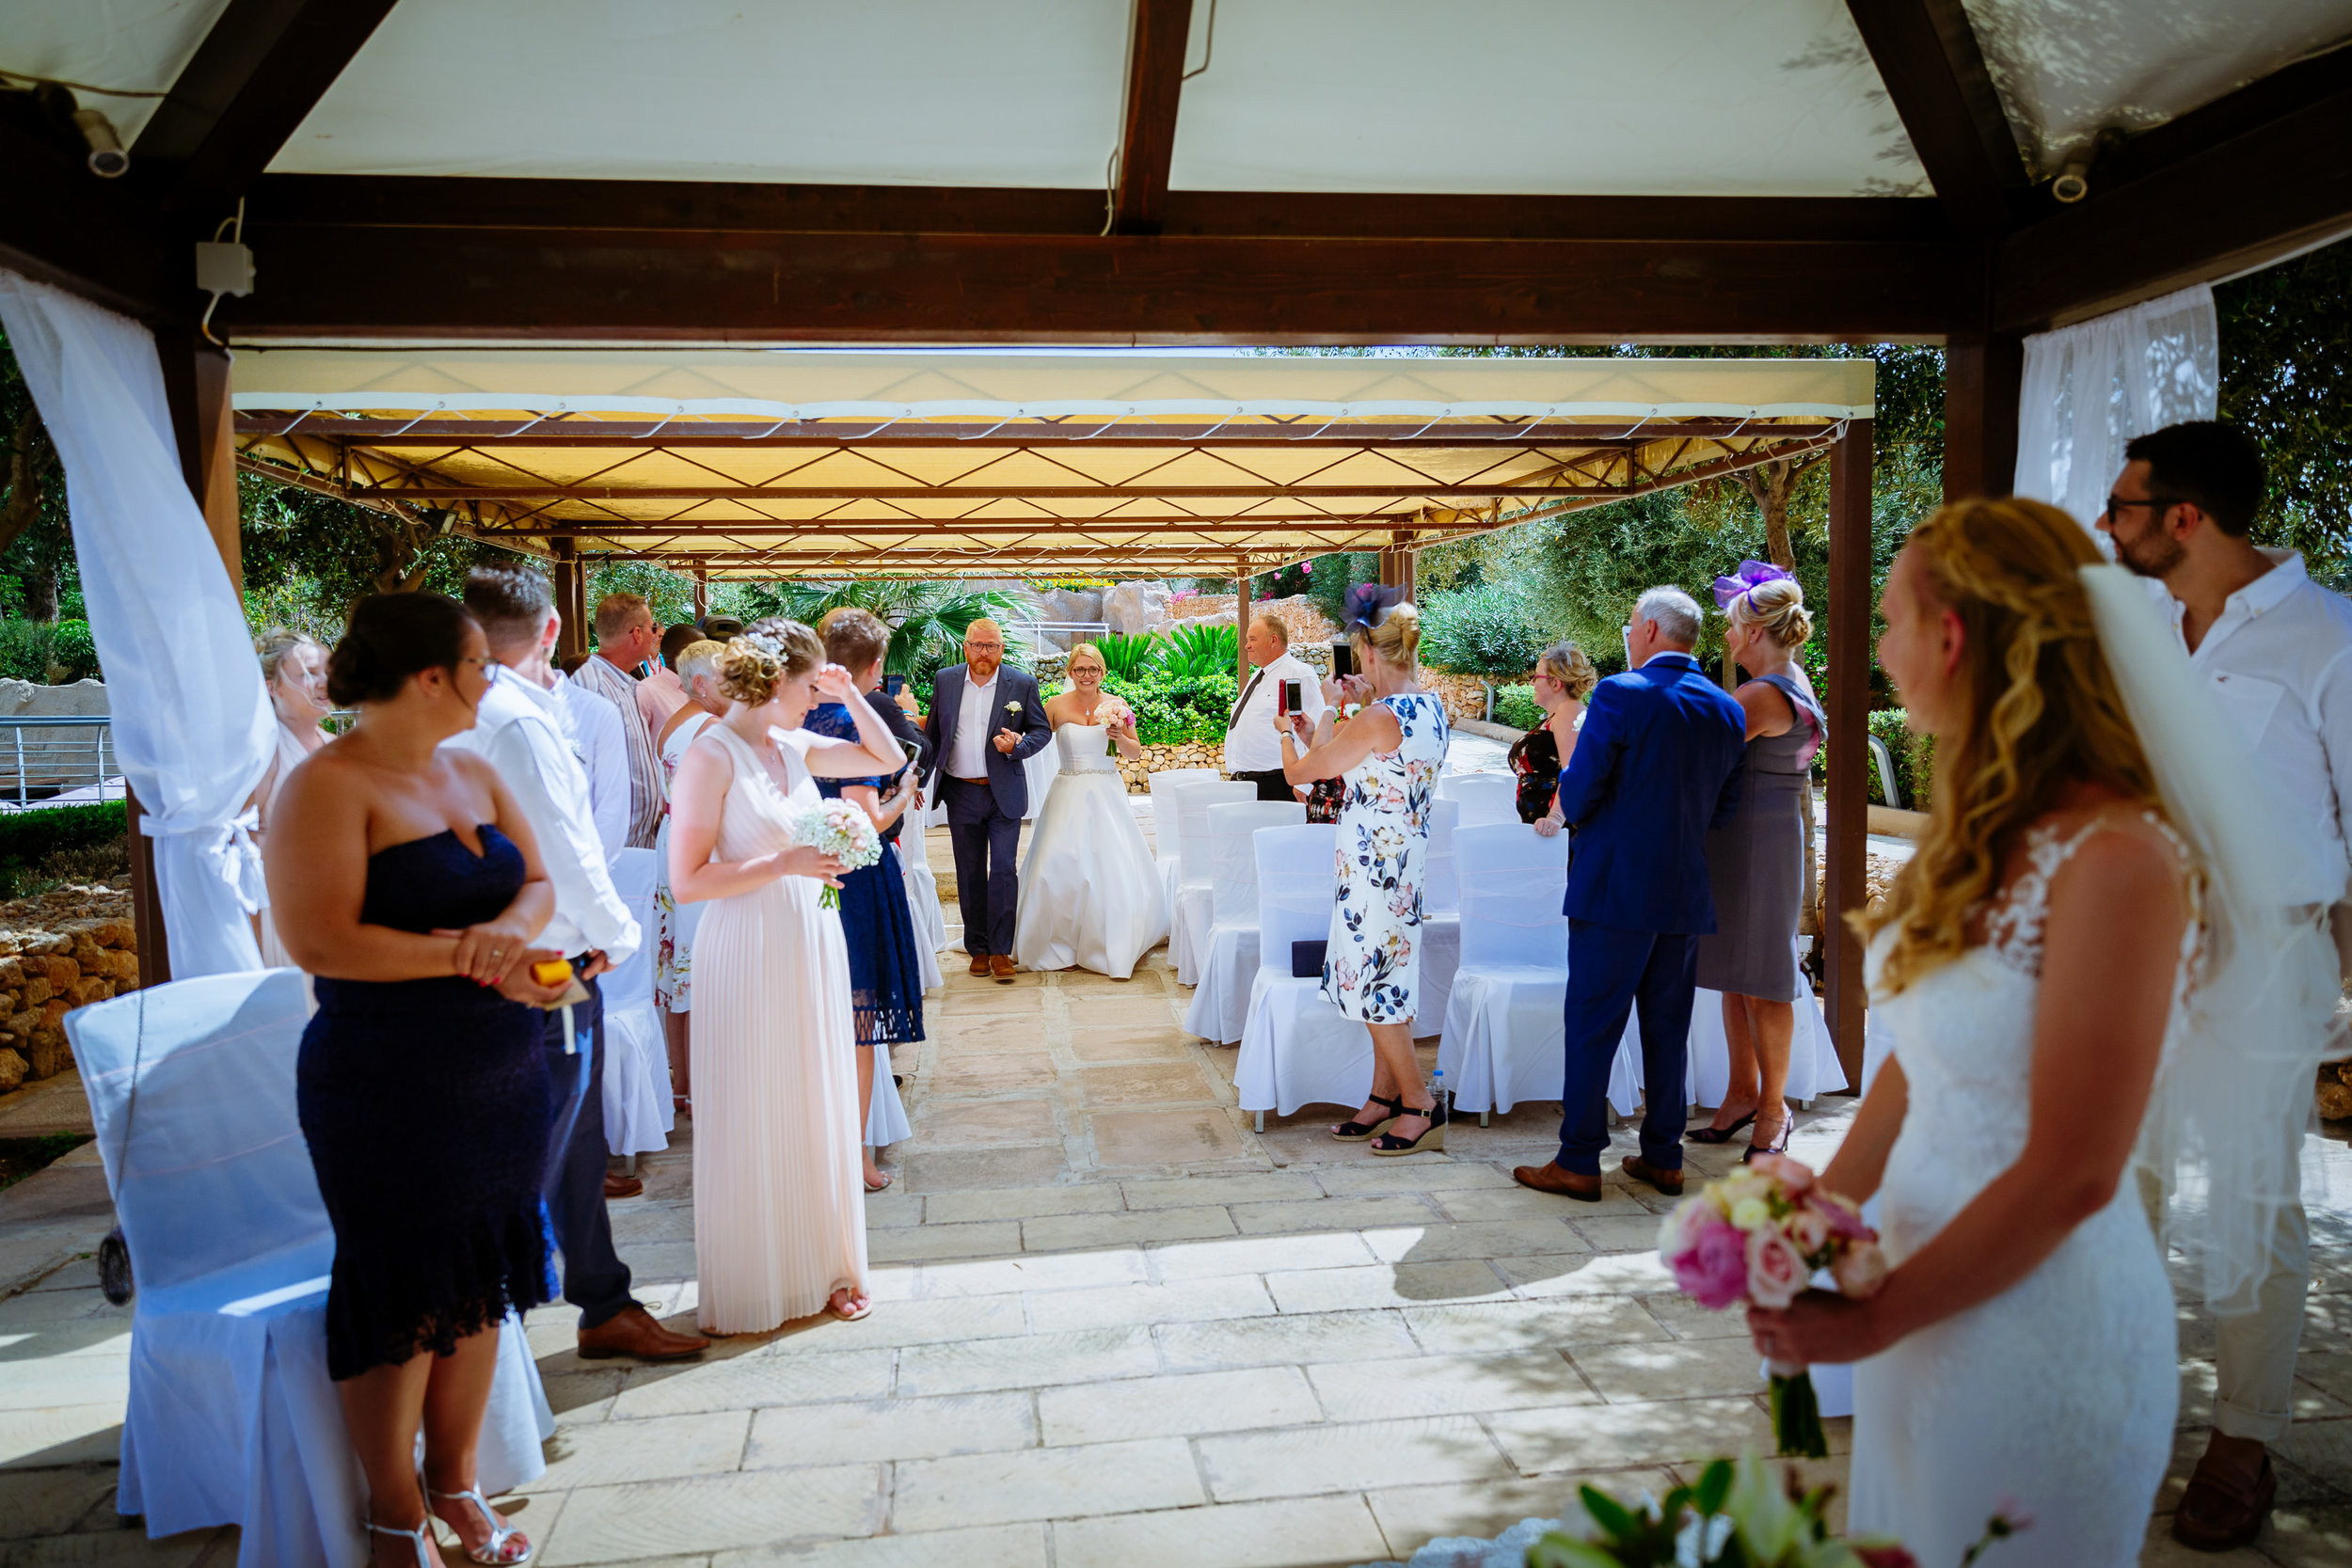 Malta_wedding_photography-46.jpg